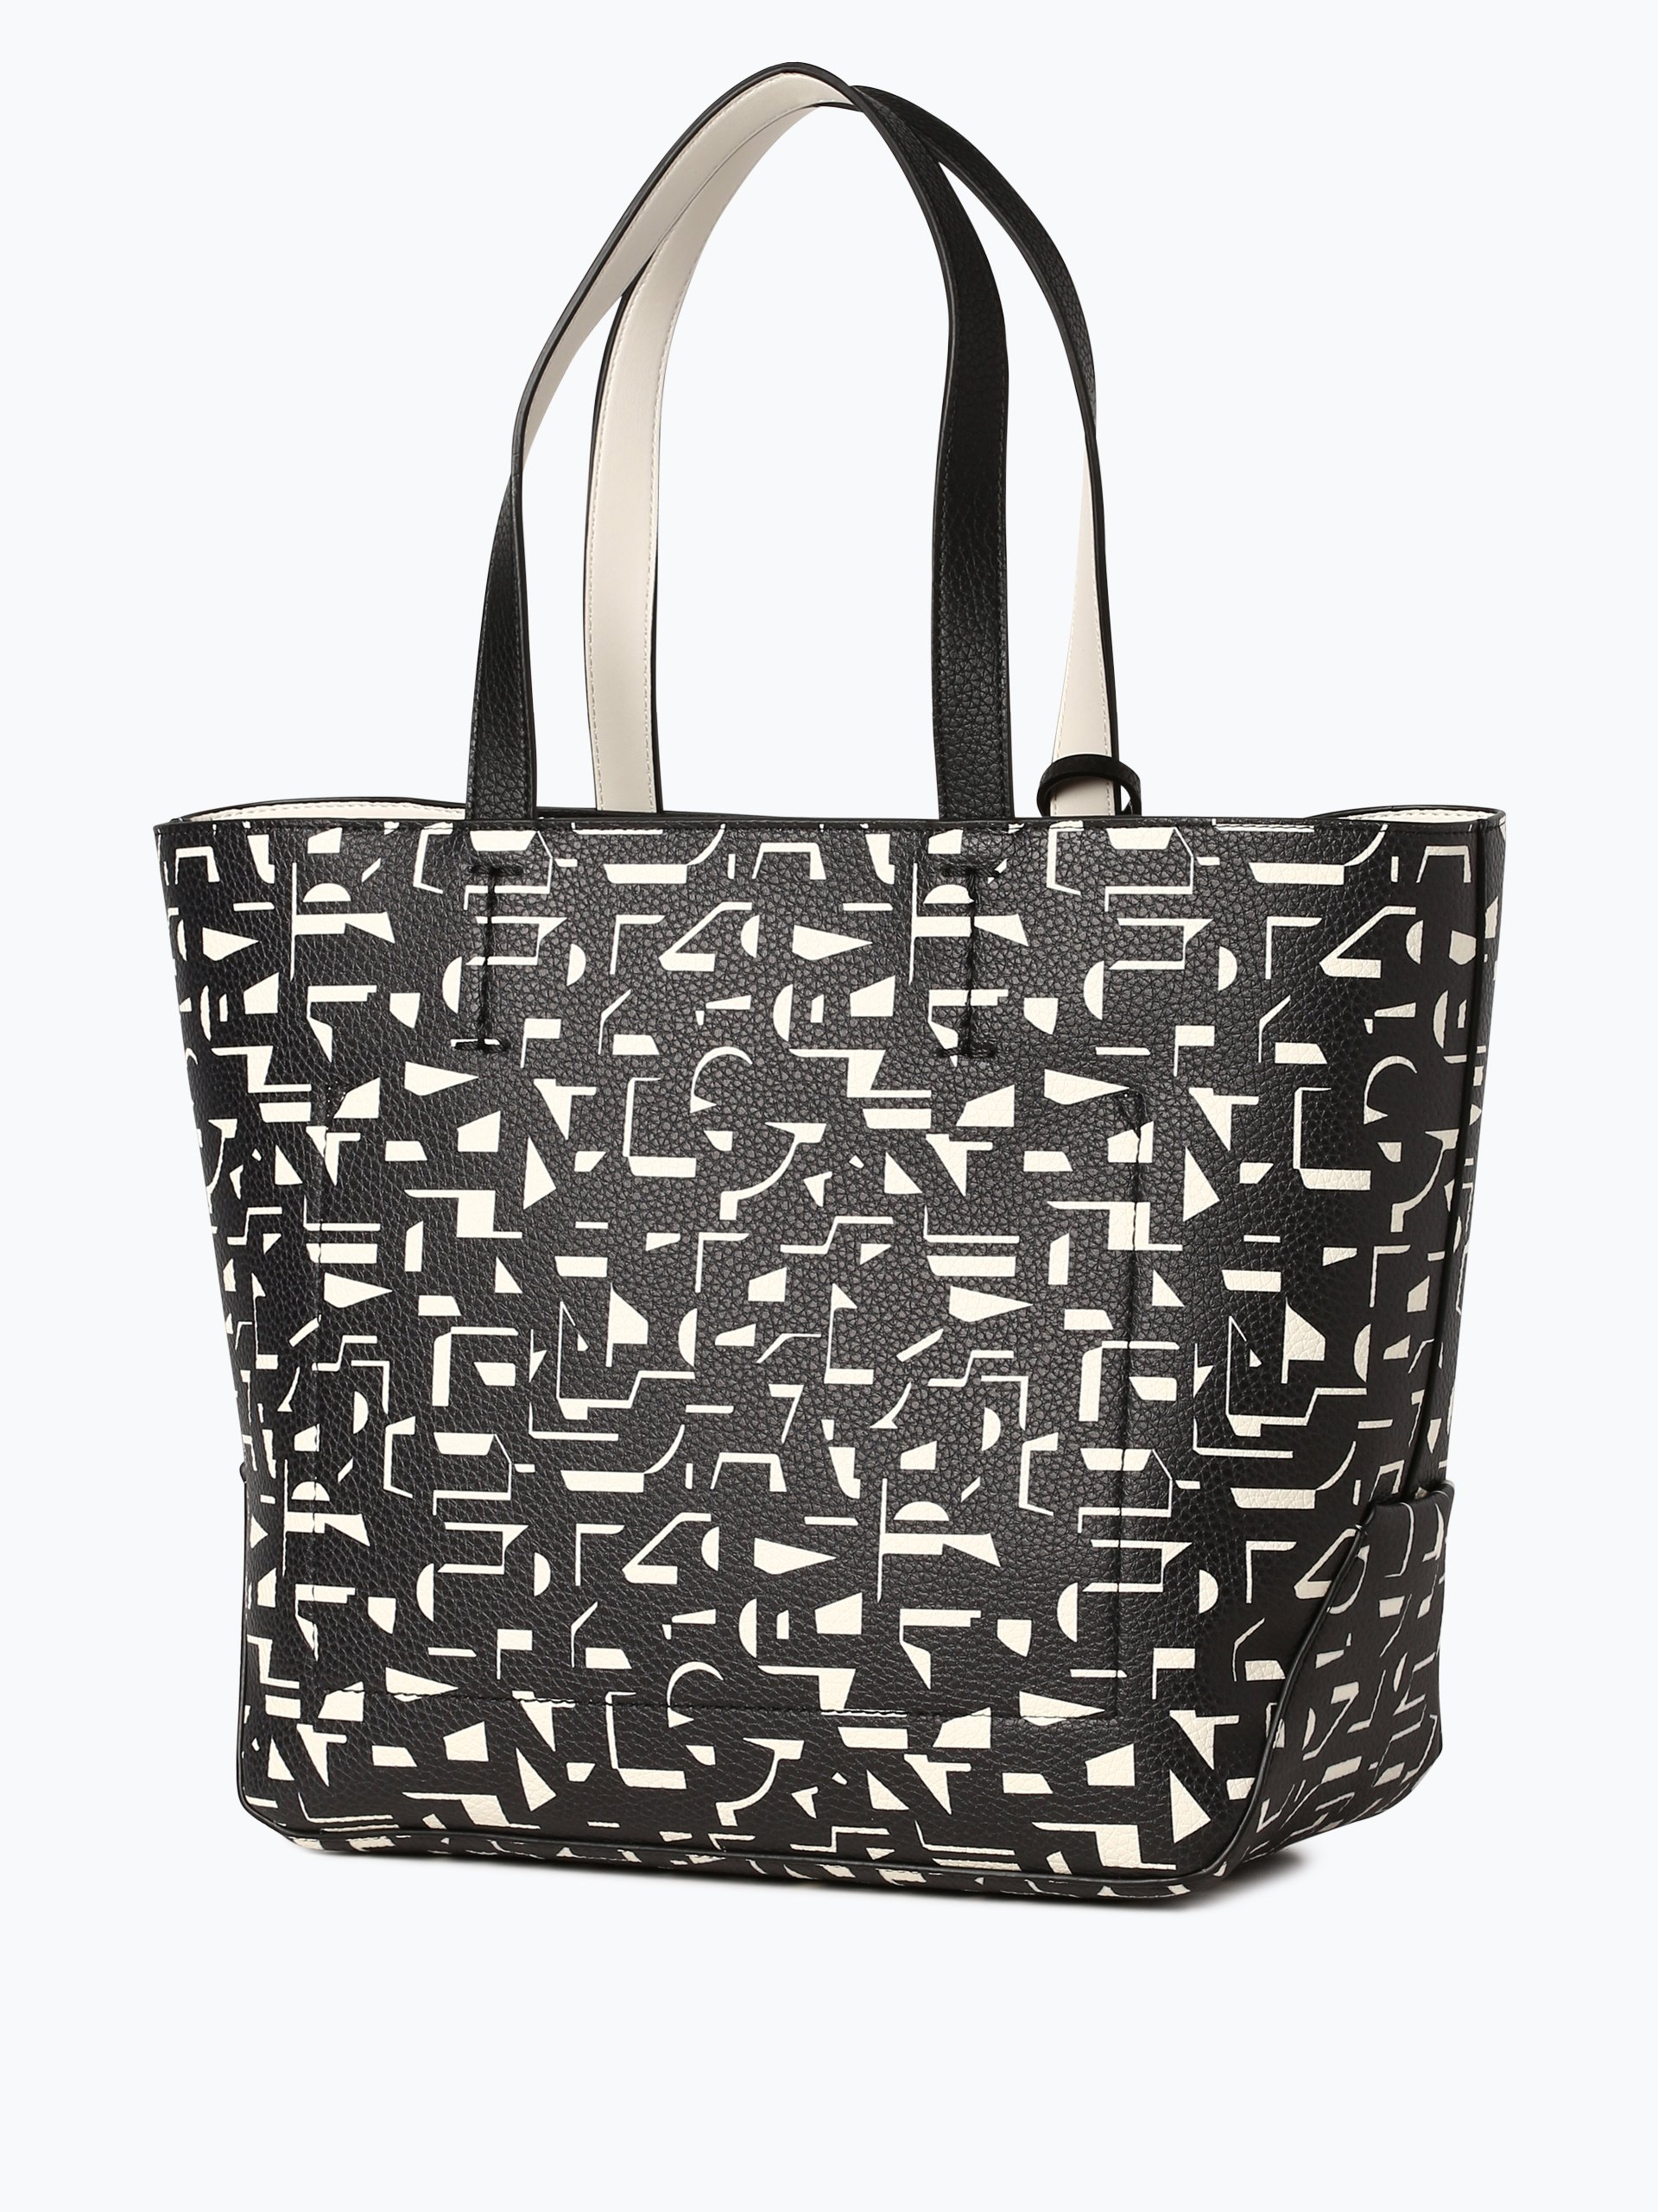 calvin klein damen handtasche schwarz gemustert online. Black Bedroom Furniture Sets. Home Design Ideas